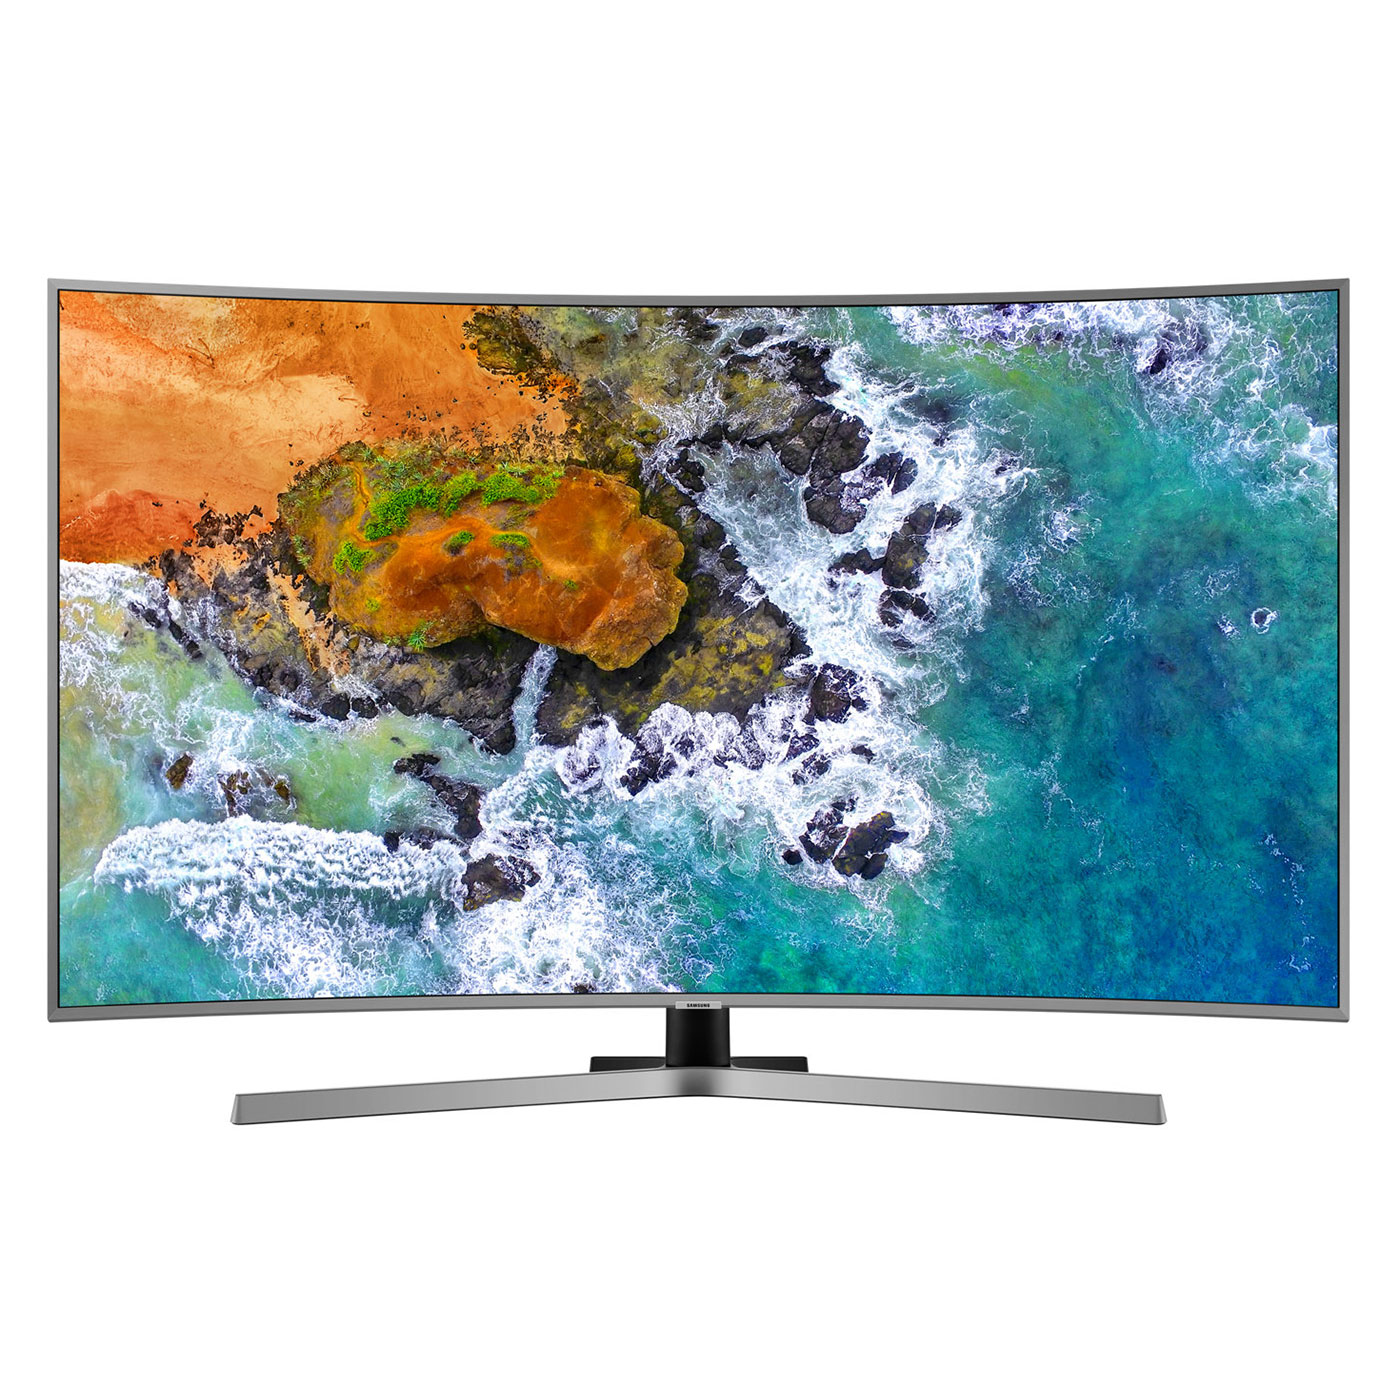 "TV Samsung UE55NU7645 Téléviseur incurvé LED 4K 55"" (140 cm) 16/9 - 3840 x 2160 pixels - Ultra HD - HDR - Wi-Fi - Bluetooth - 1900 PQI"